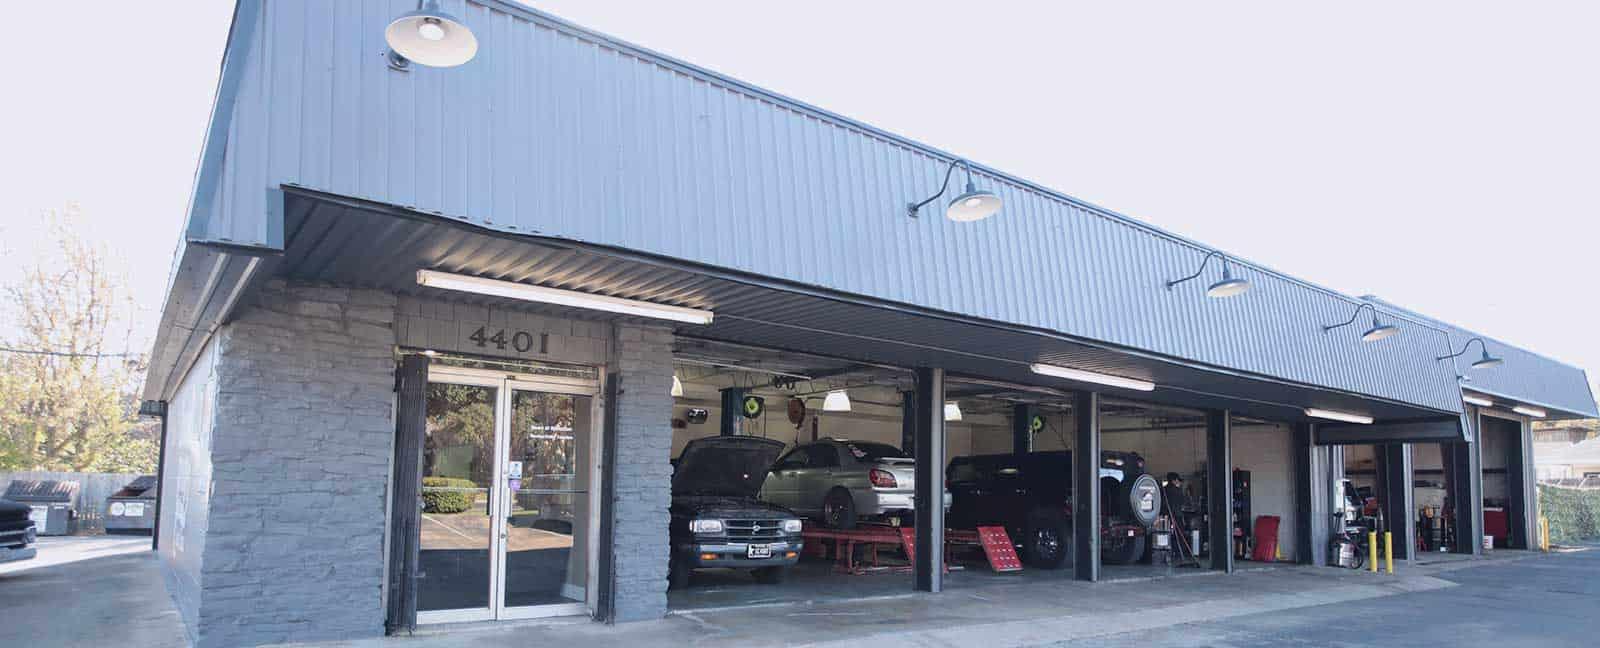 Local Mechanic Shop - Carcody